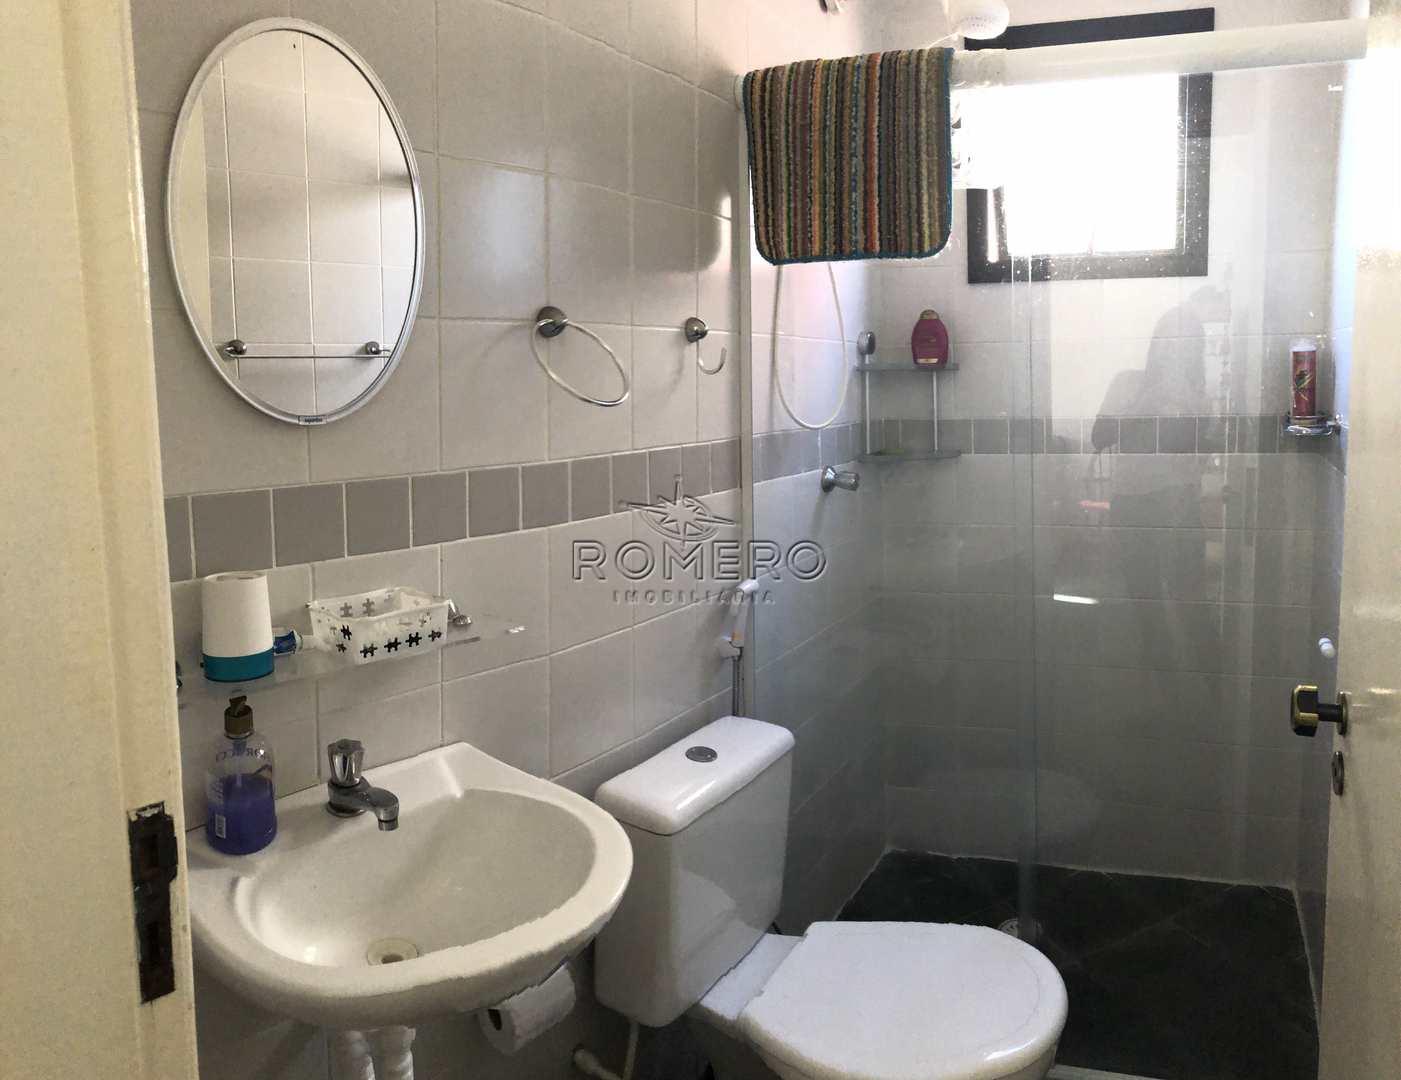 Apartamento com 2 dorms, Itagua, Ubatuba - R$ 350 mil, Cod: 1312